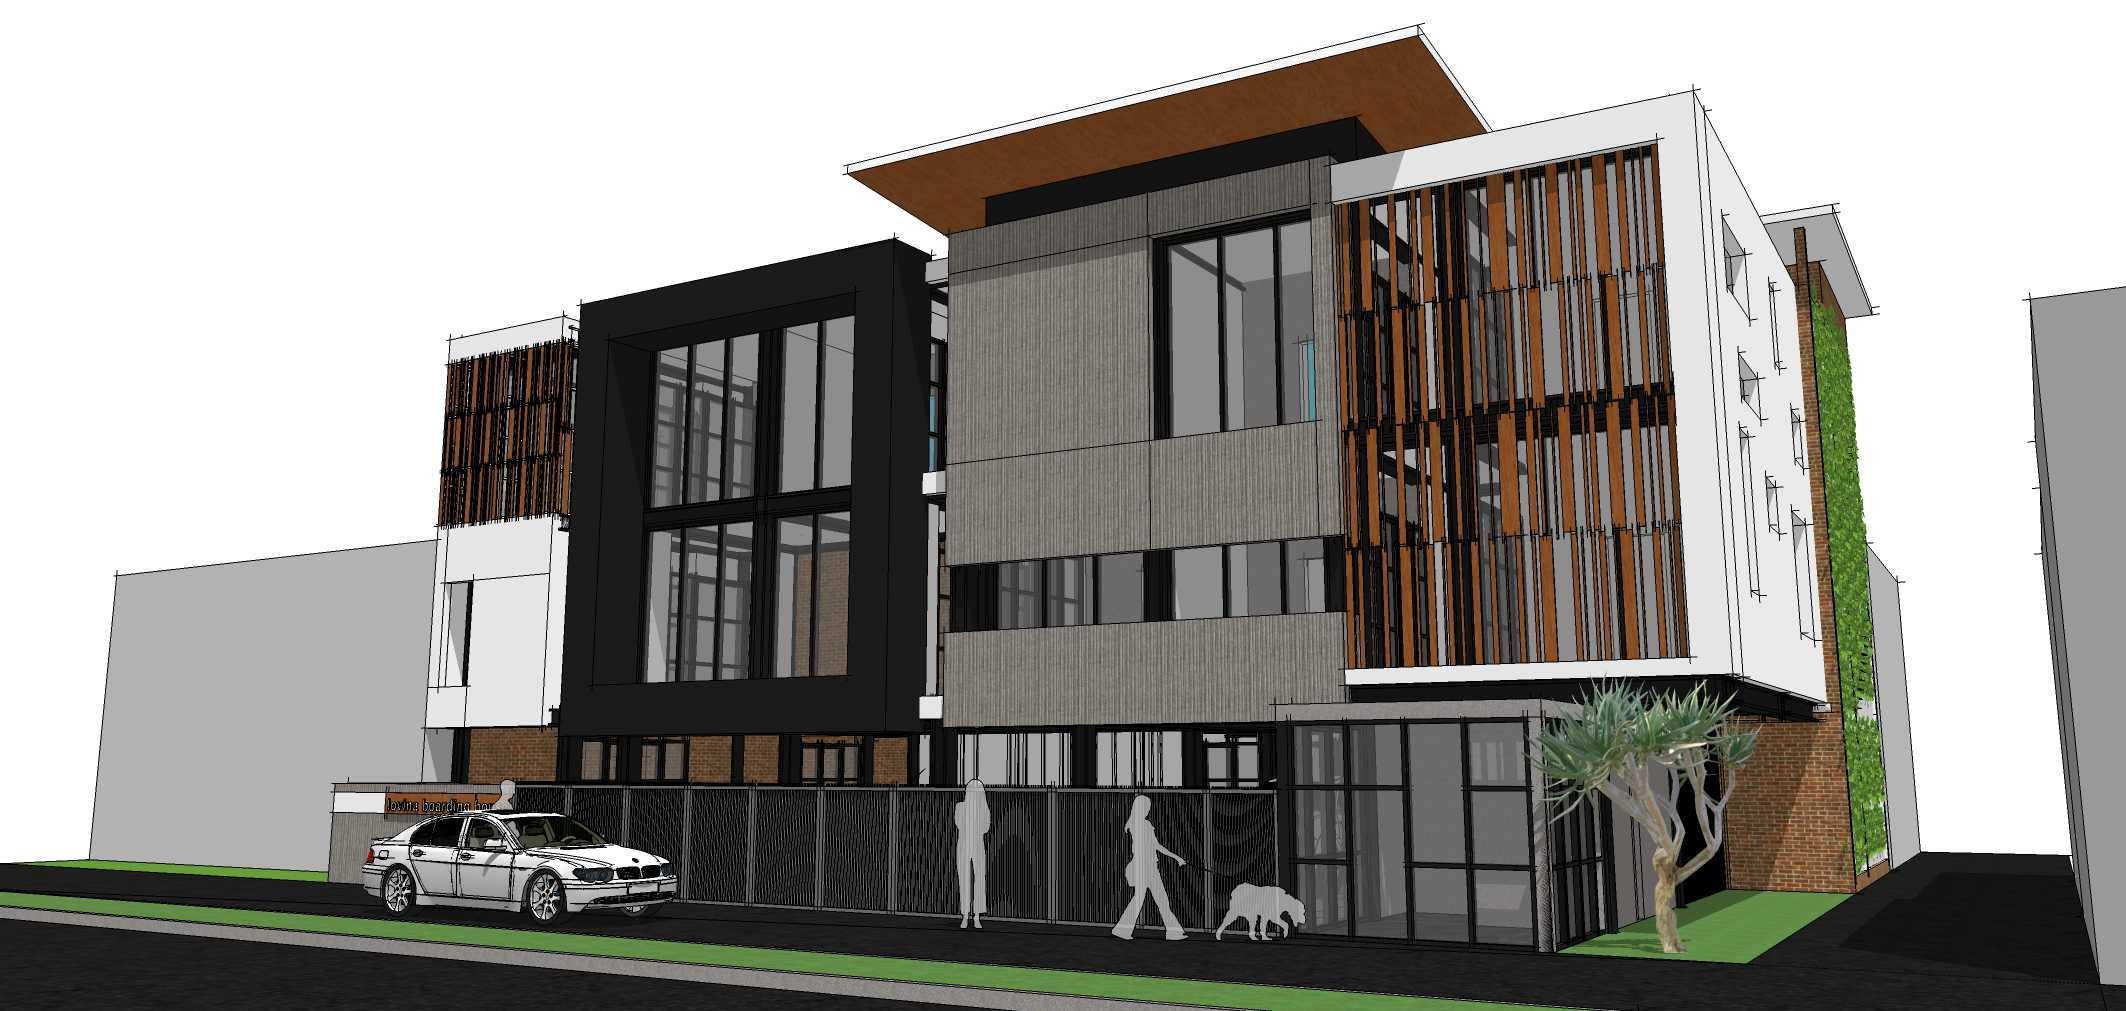 Duatitik Architecture Lovina Boarding House Malang, Kota Malang, Jawa Timur, Indonesia Malang, Kota Malang, Jawa Timur, Indonesia 2   37423